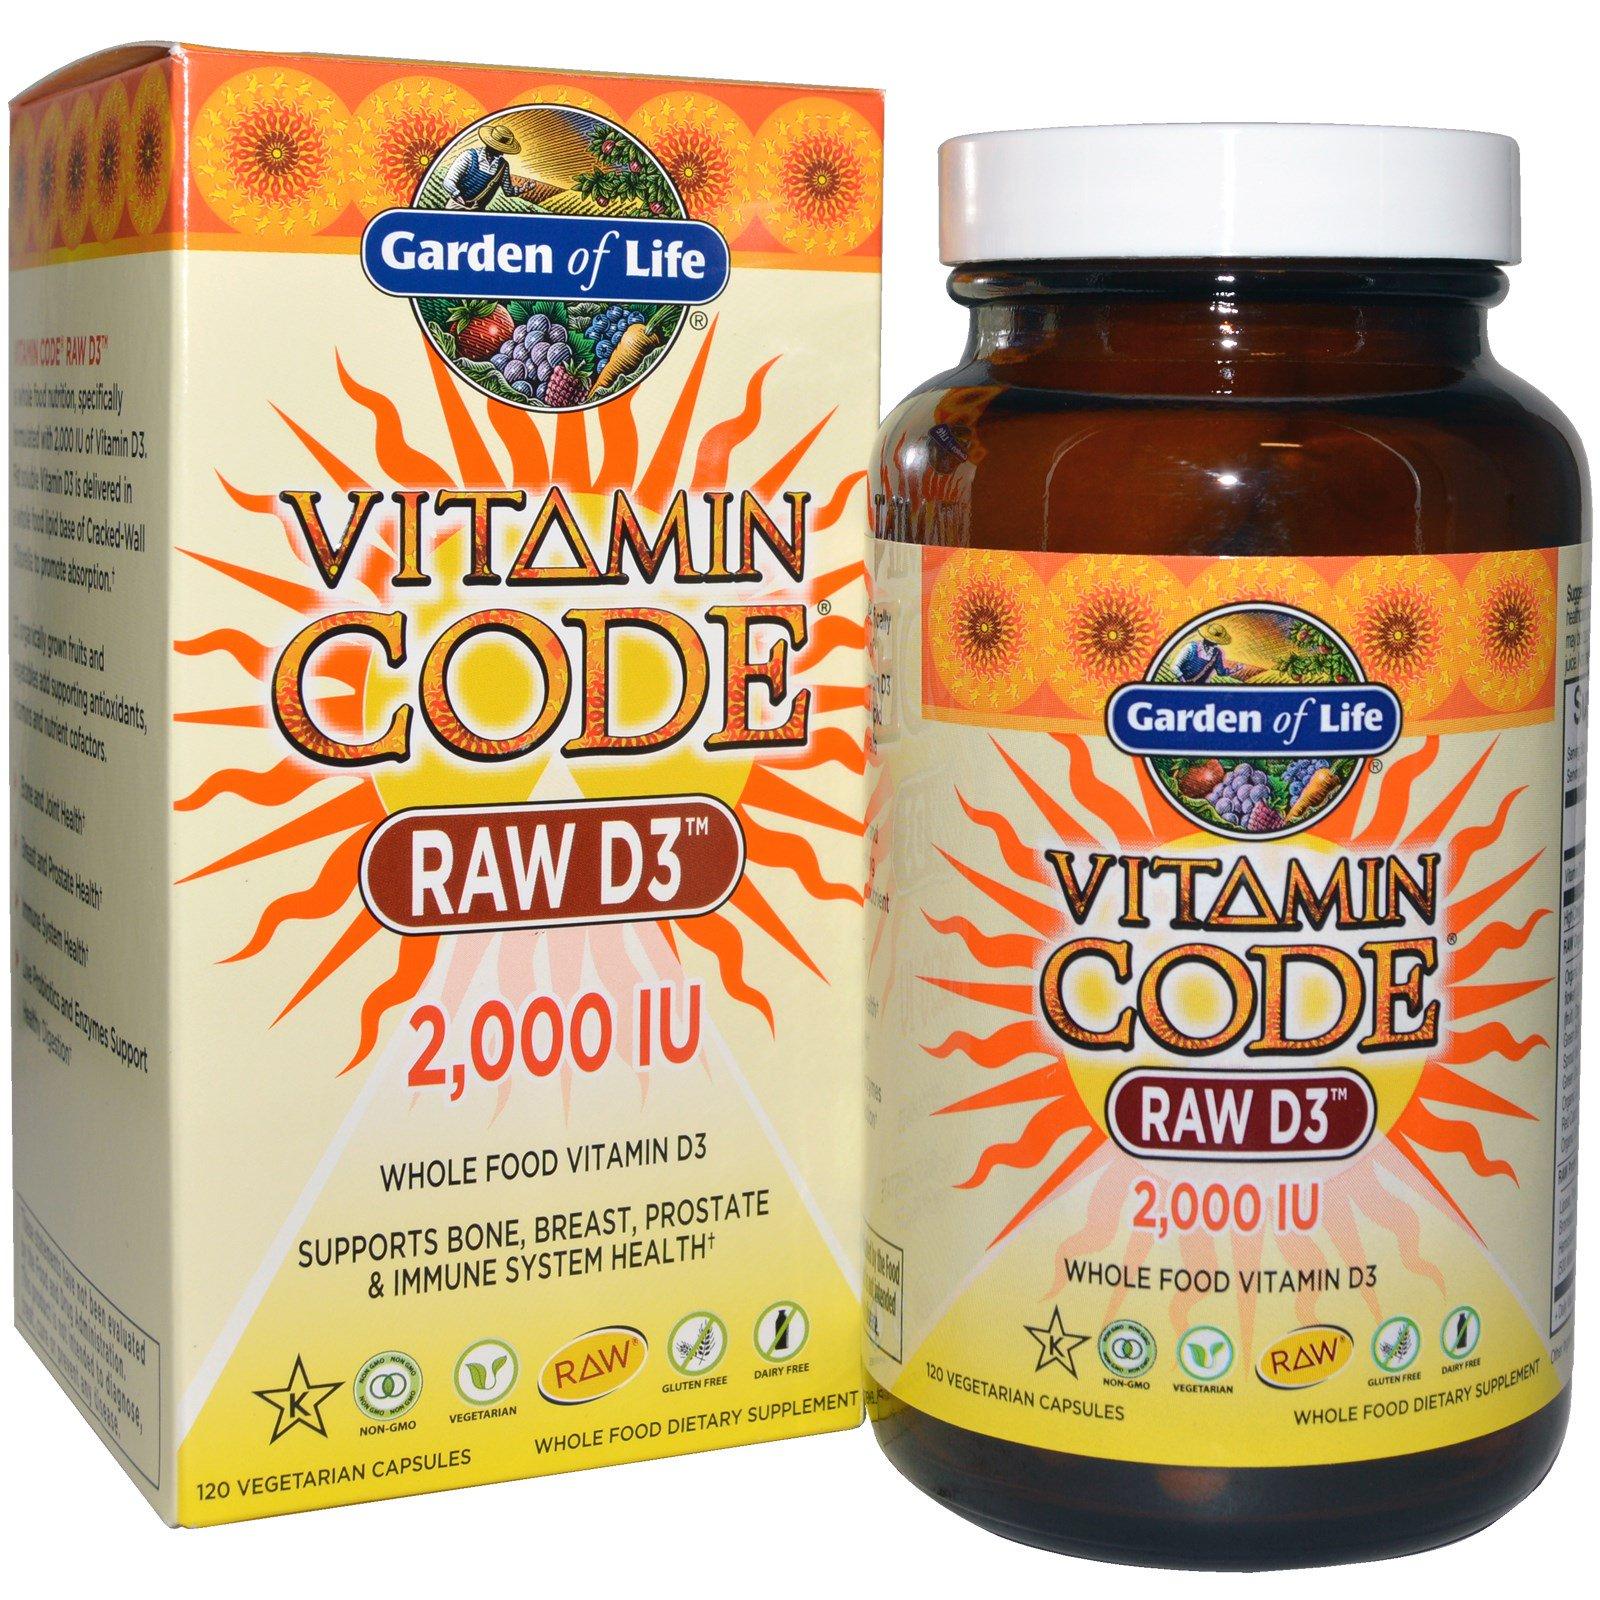 Garden of Life, Vitamin Code, необработанный витамин D3, 2,000 МЕ, 120 капсул UltraZorbe